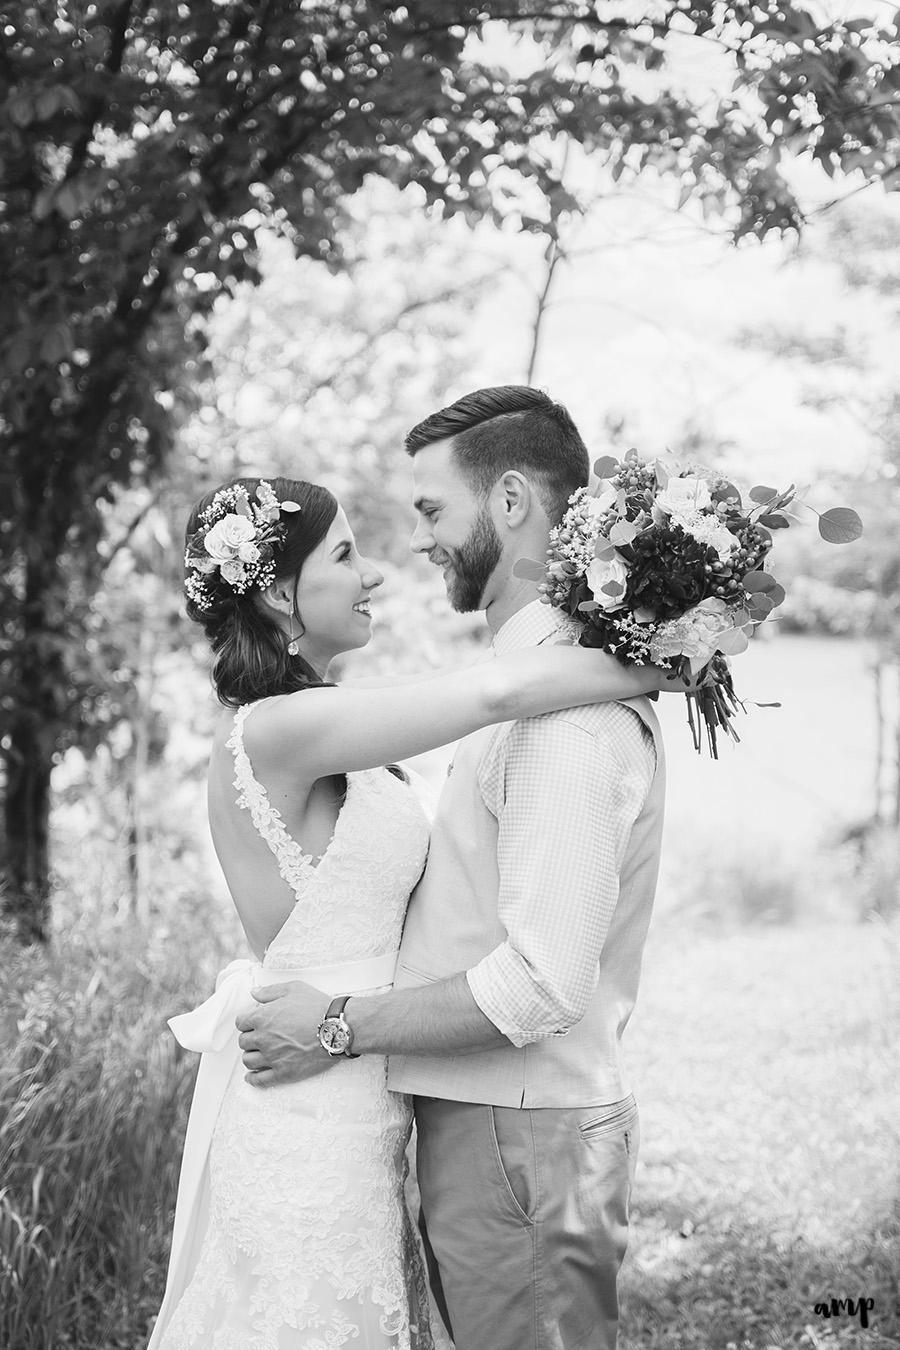 bride and groom | Ali and Joe's #gardenwedding by amanda.matilda.photography | Colorado Wedding Photographer